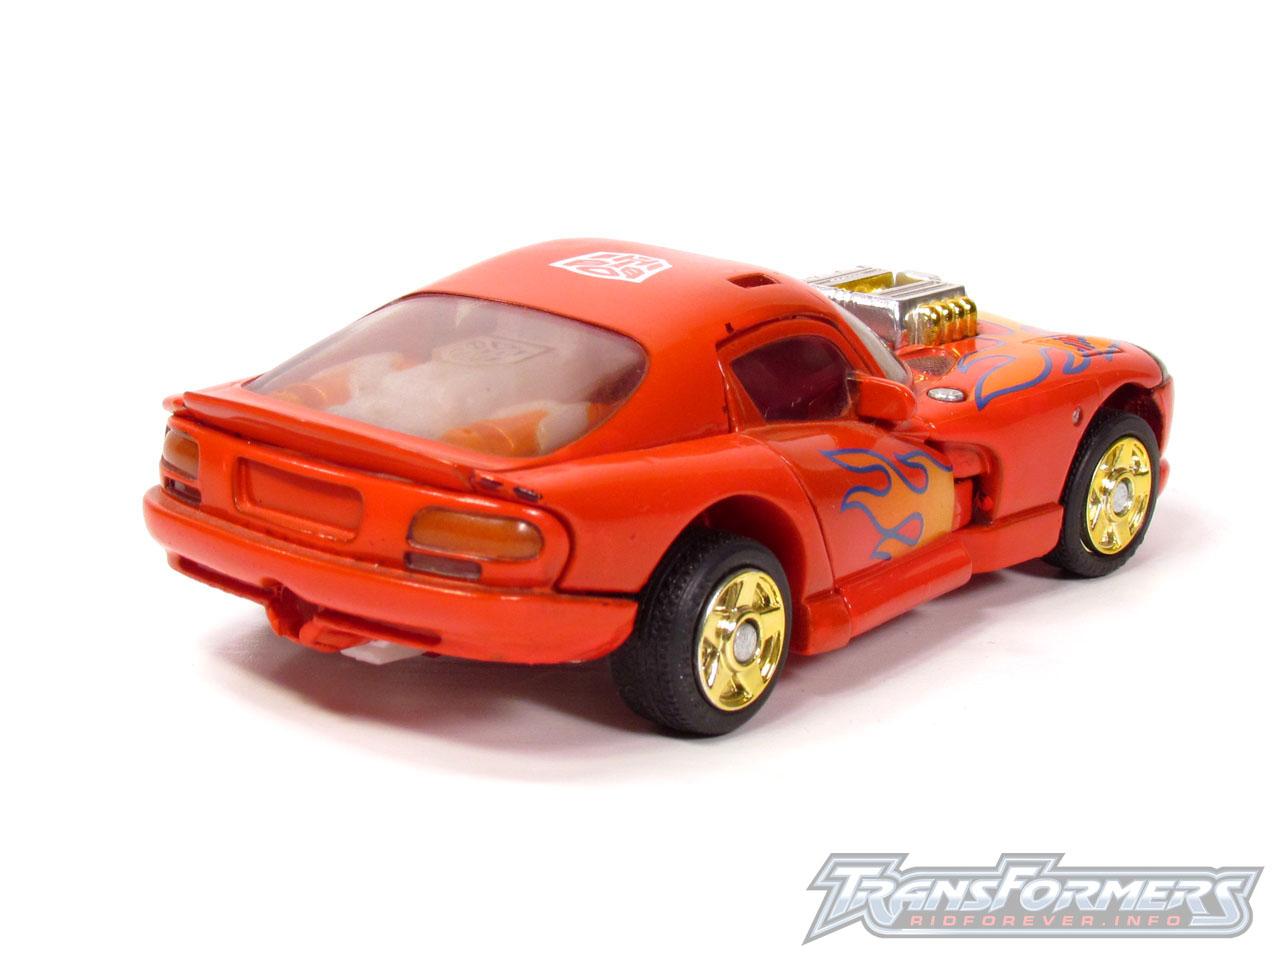 Sideburn Super 003